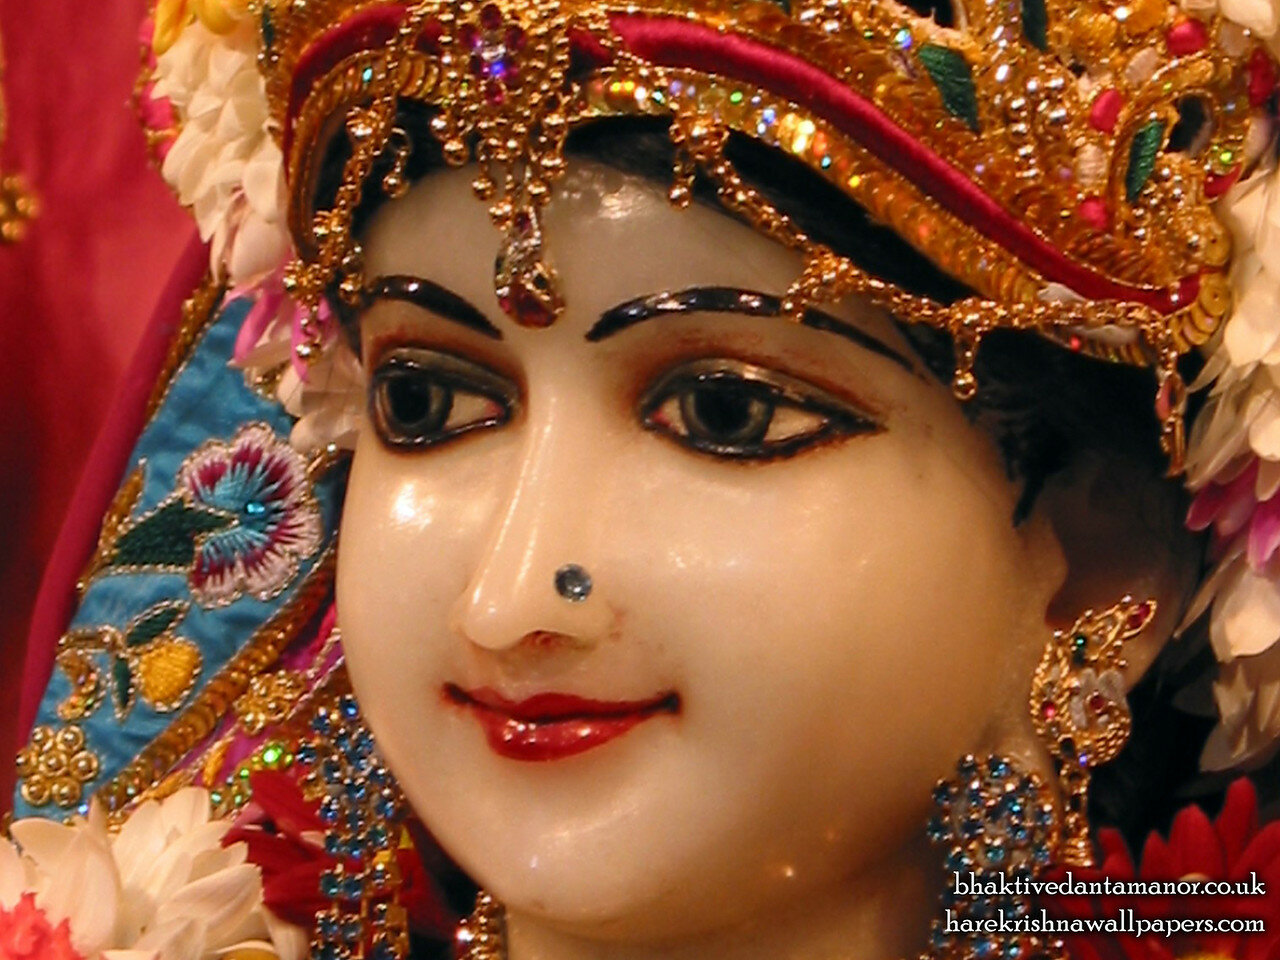 �������� ������� ���������, ���� ������ ������������� �����, ������ (Sri Radha)